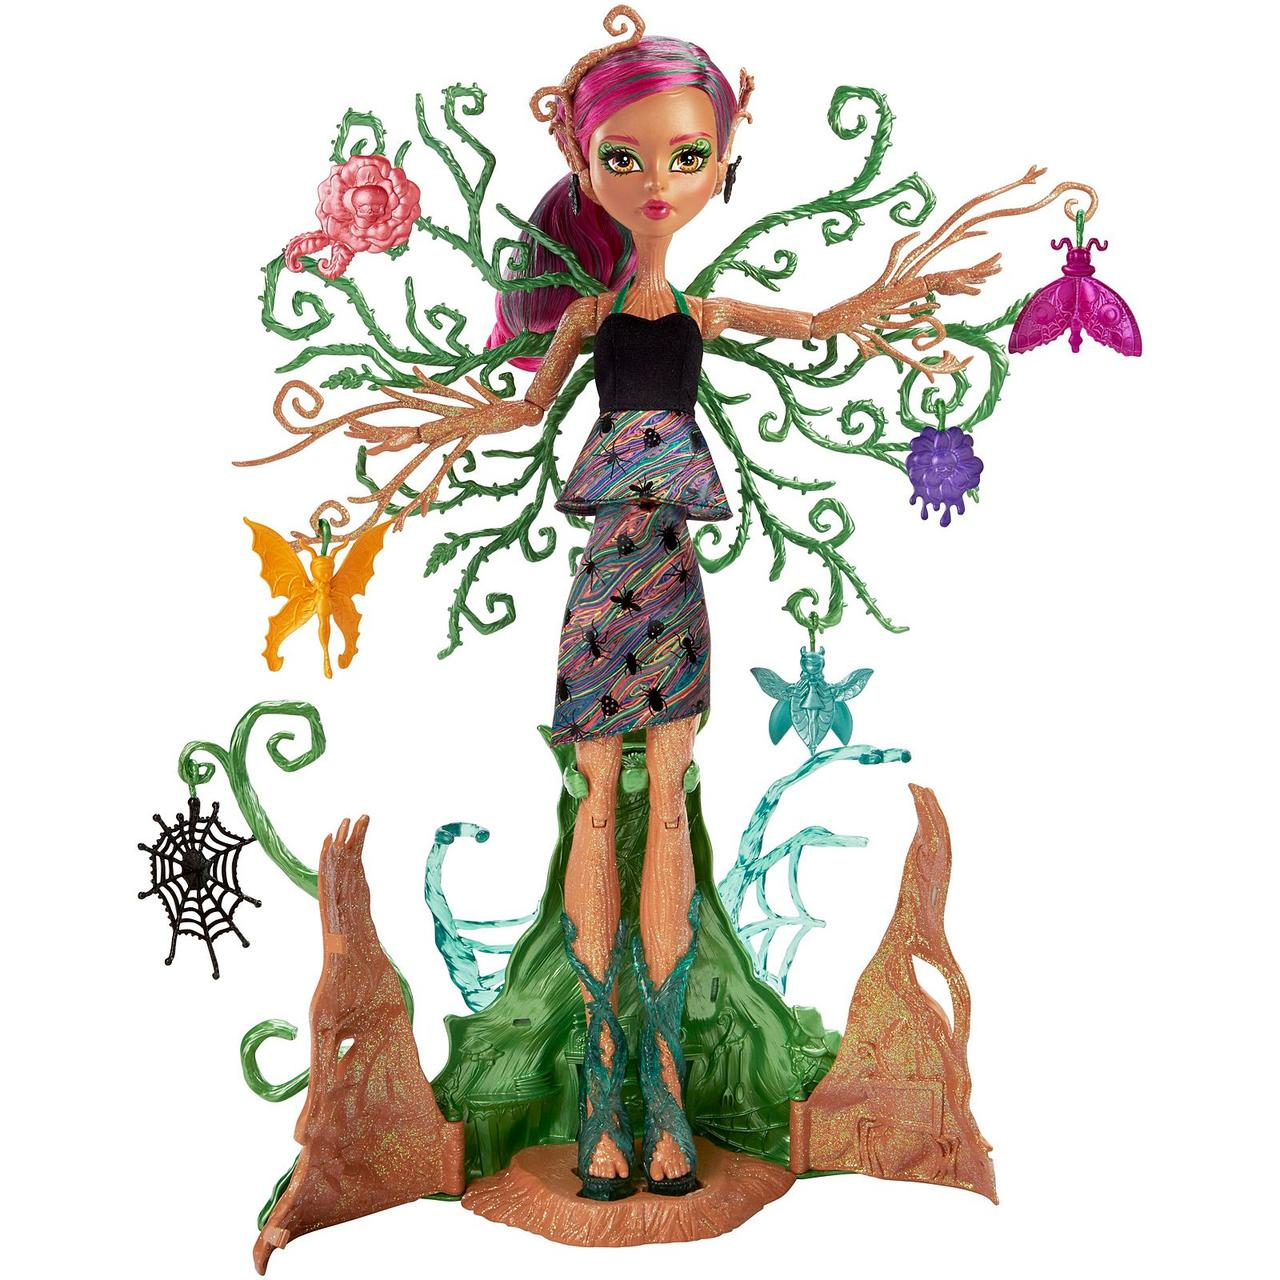 Кукла Триза Торнвиллоу серия Сад страхов, Monster High Garden Ghouls Treesa Thornwillow Doll из США